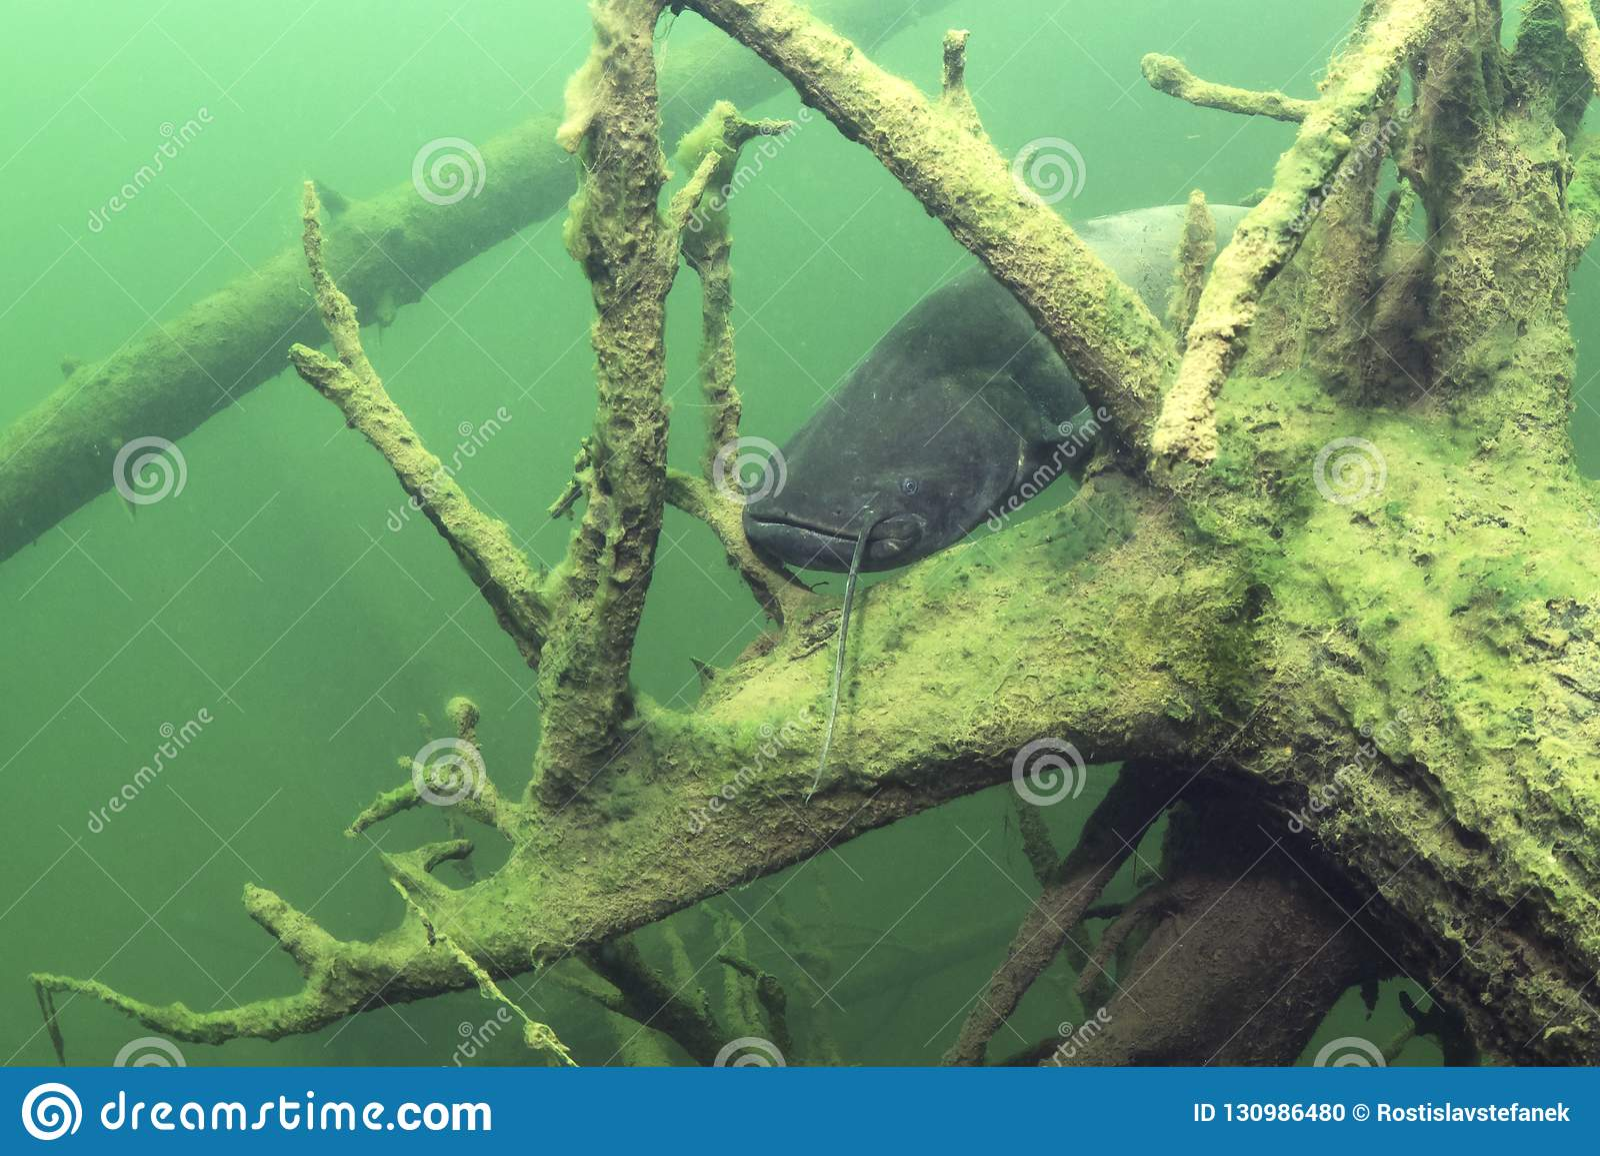 Zoetwaterglanis van Silurus van de vissen Europese Katvis Onderwater